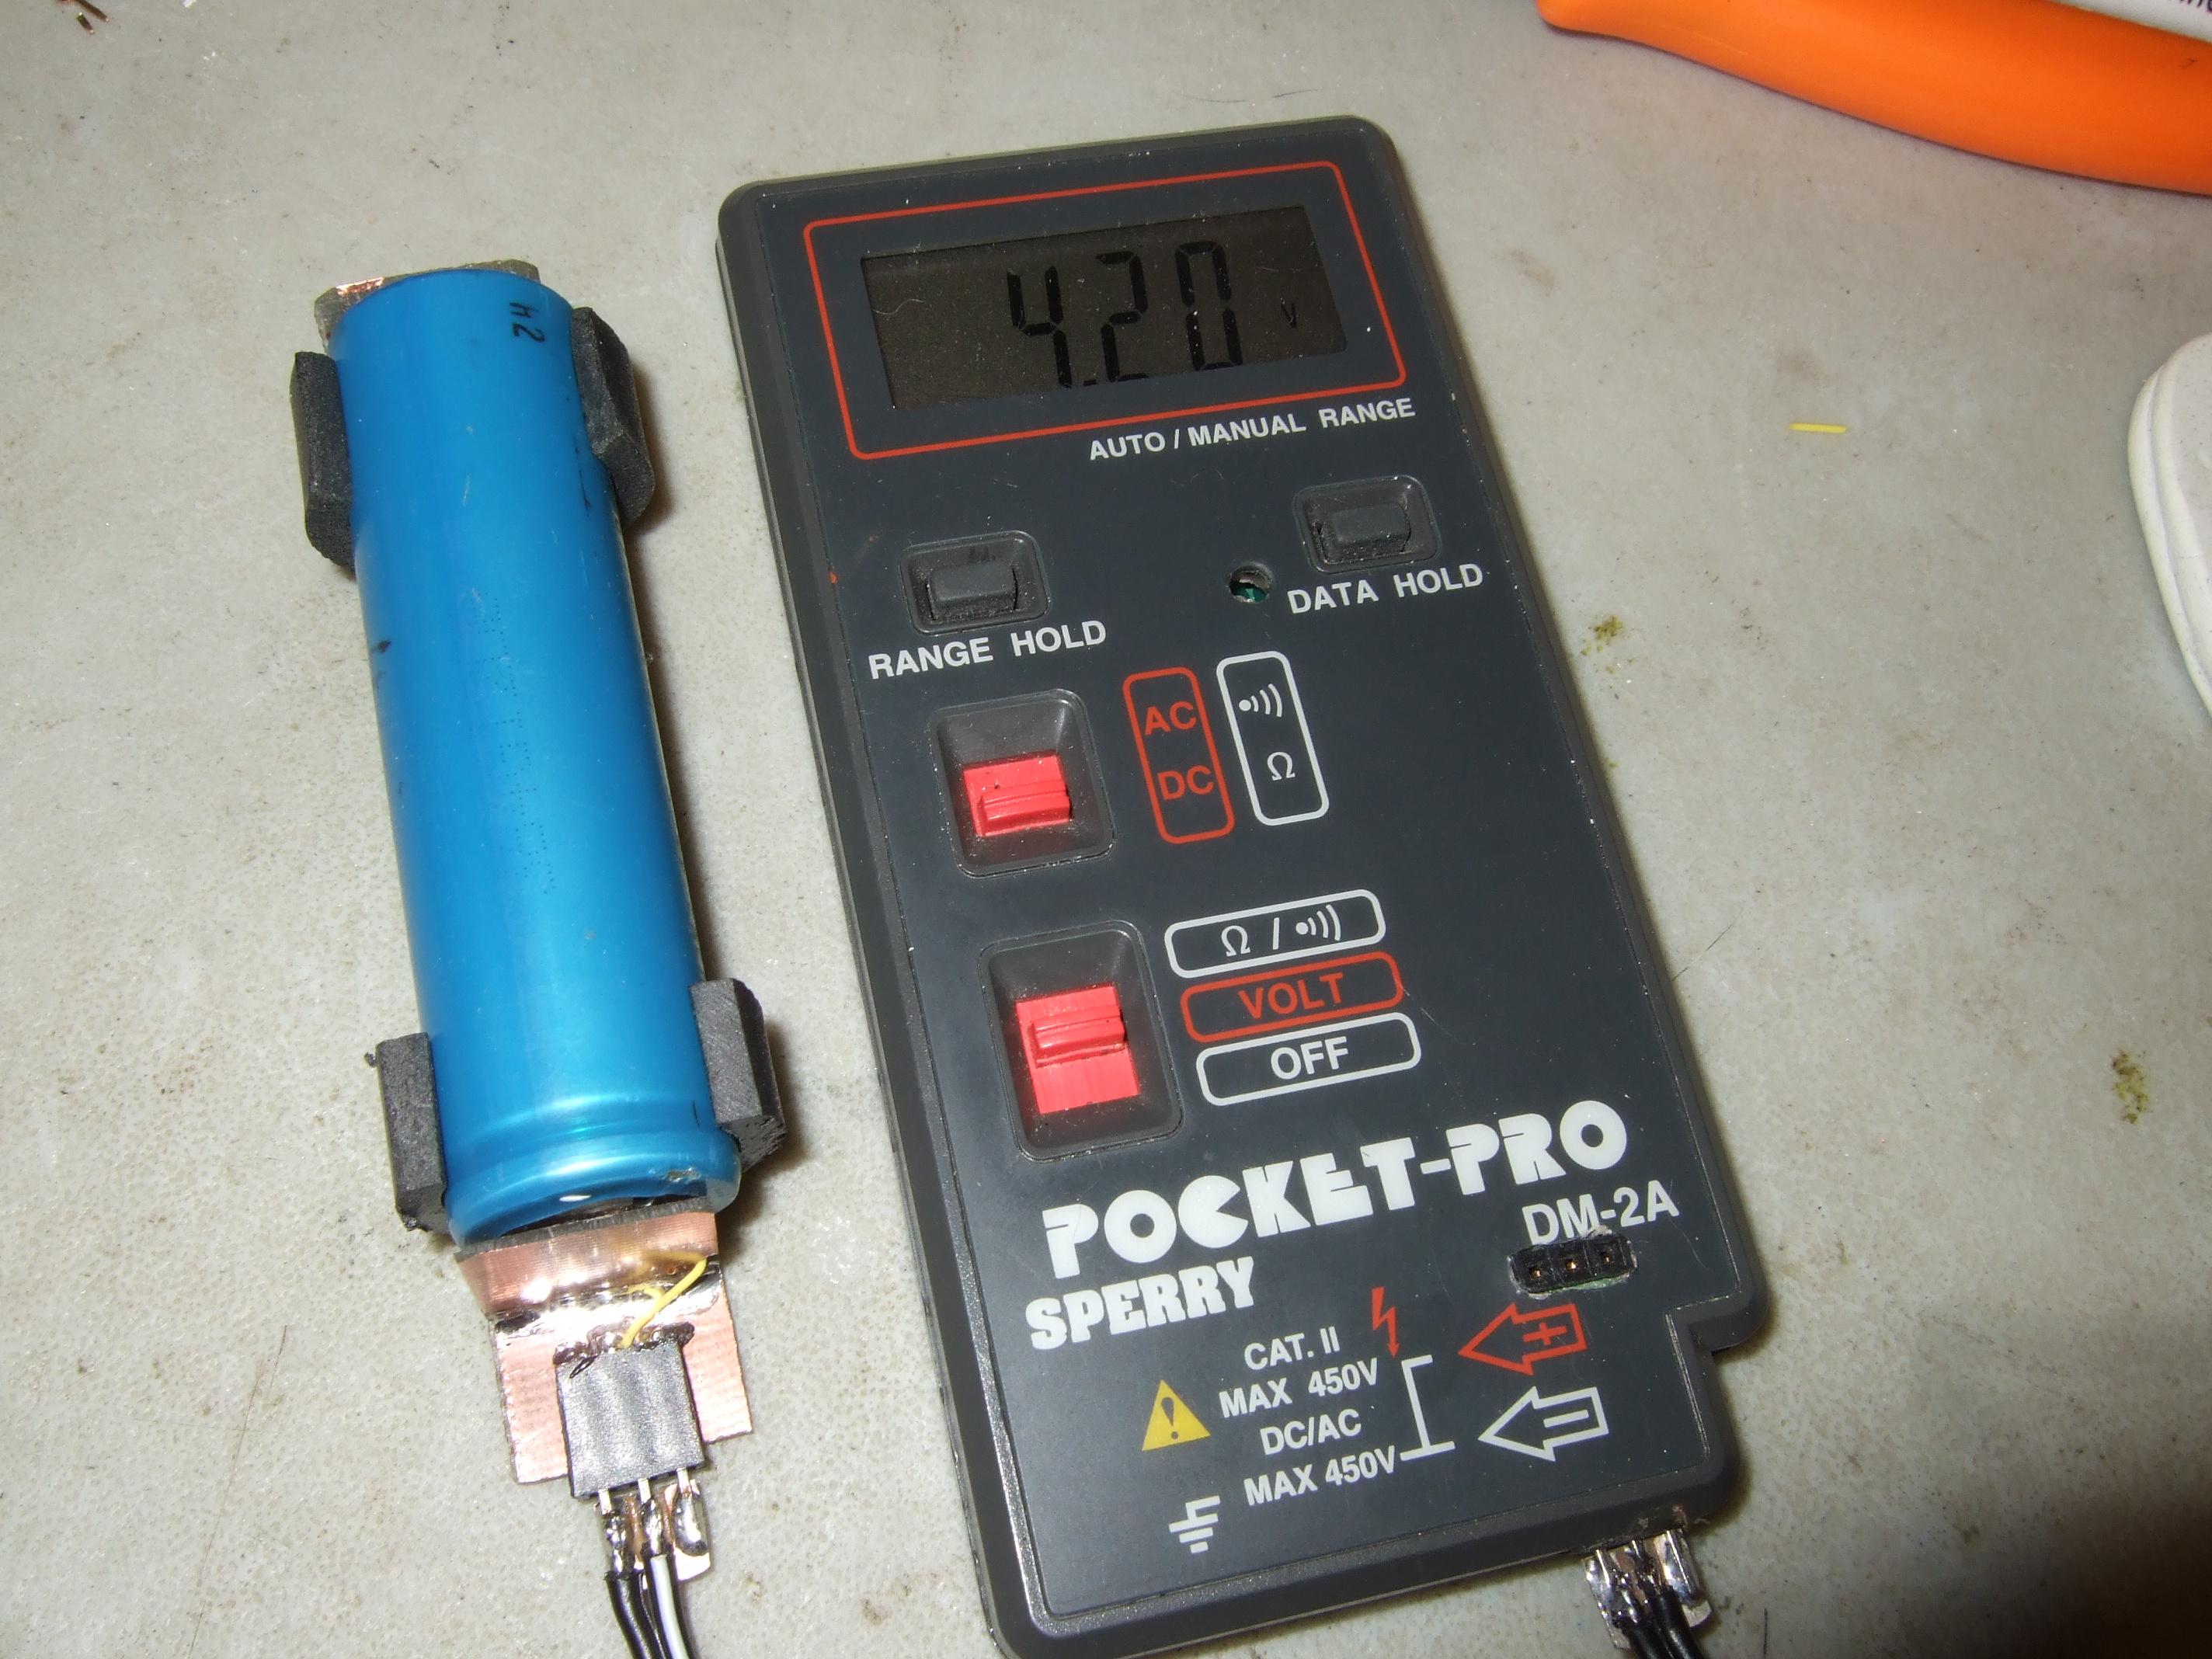 Super overcomplicated, overengineered battery holder...